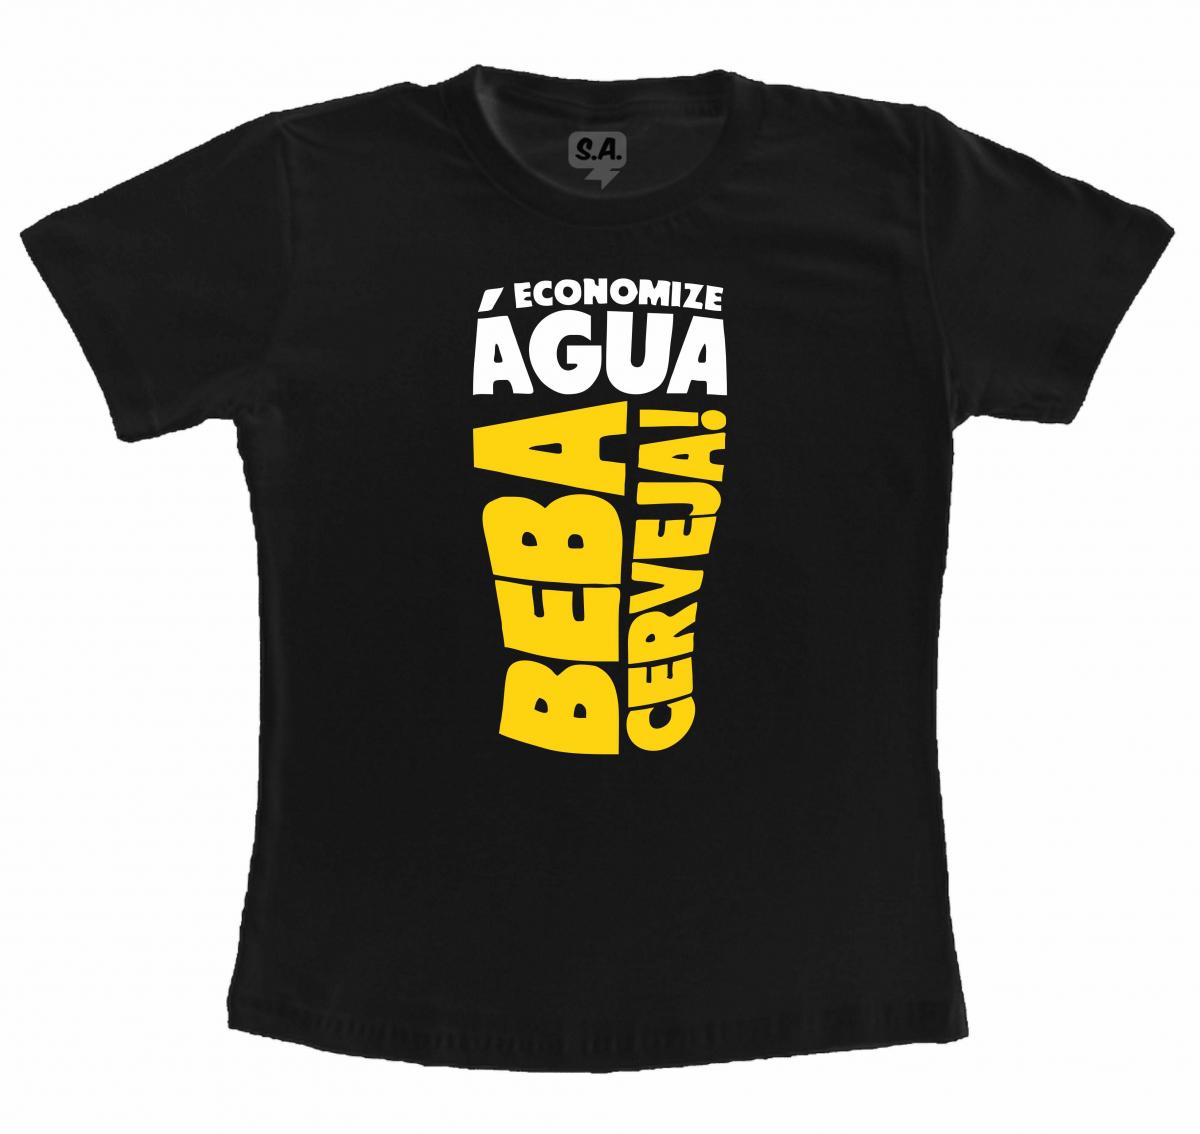 Camiseta Economize Água Beba Cerveja